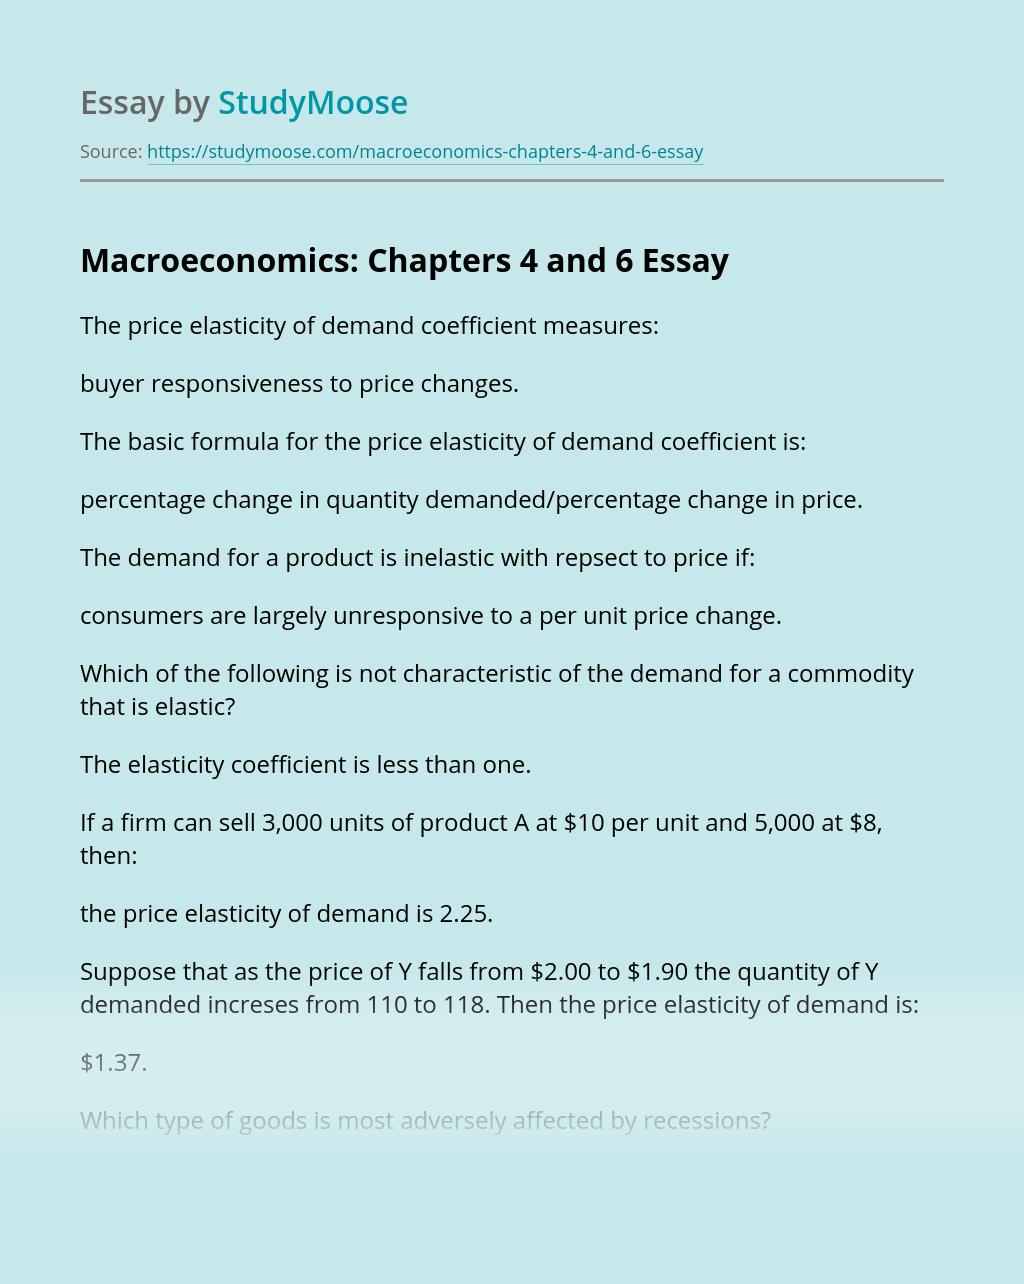 Macroeconomics: Chapters 4 and 6